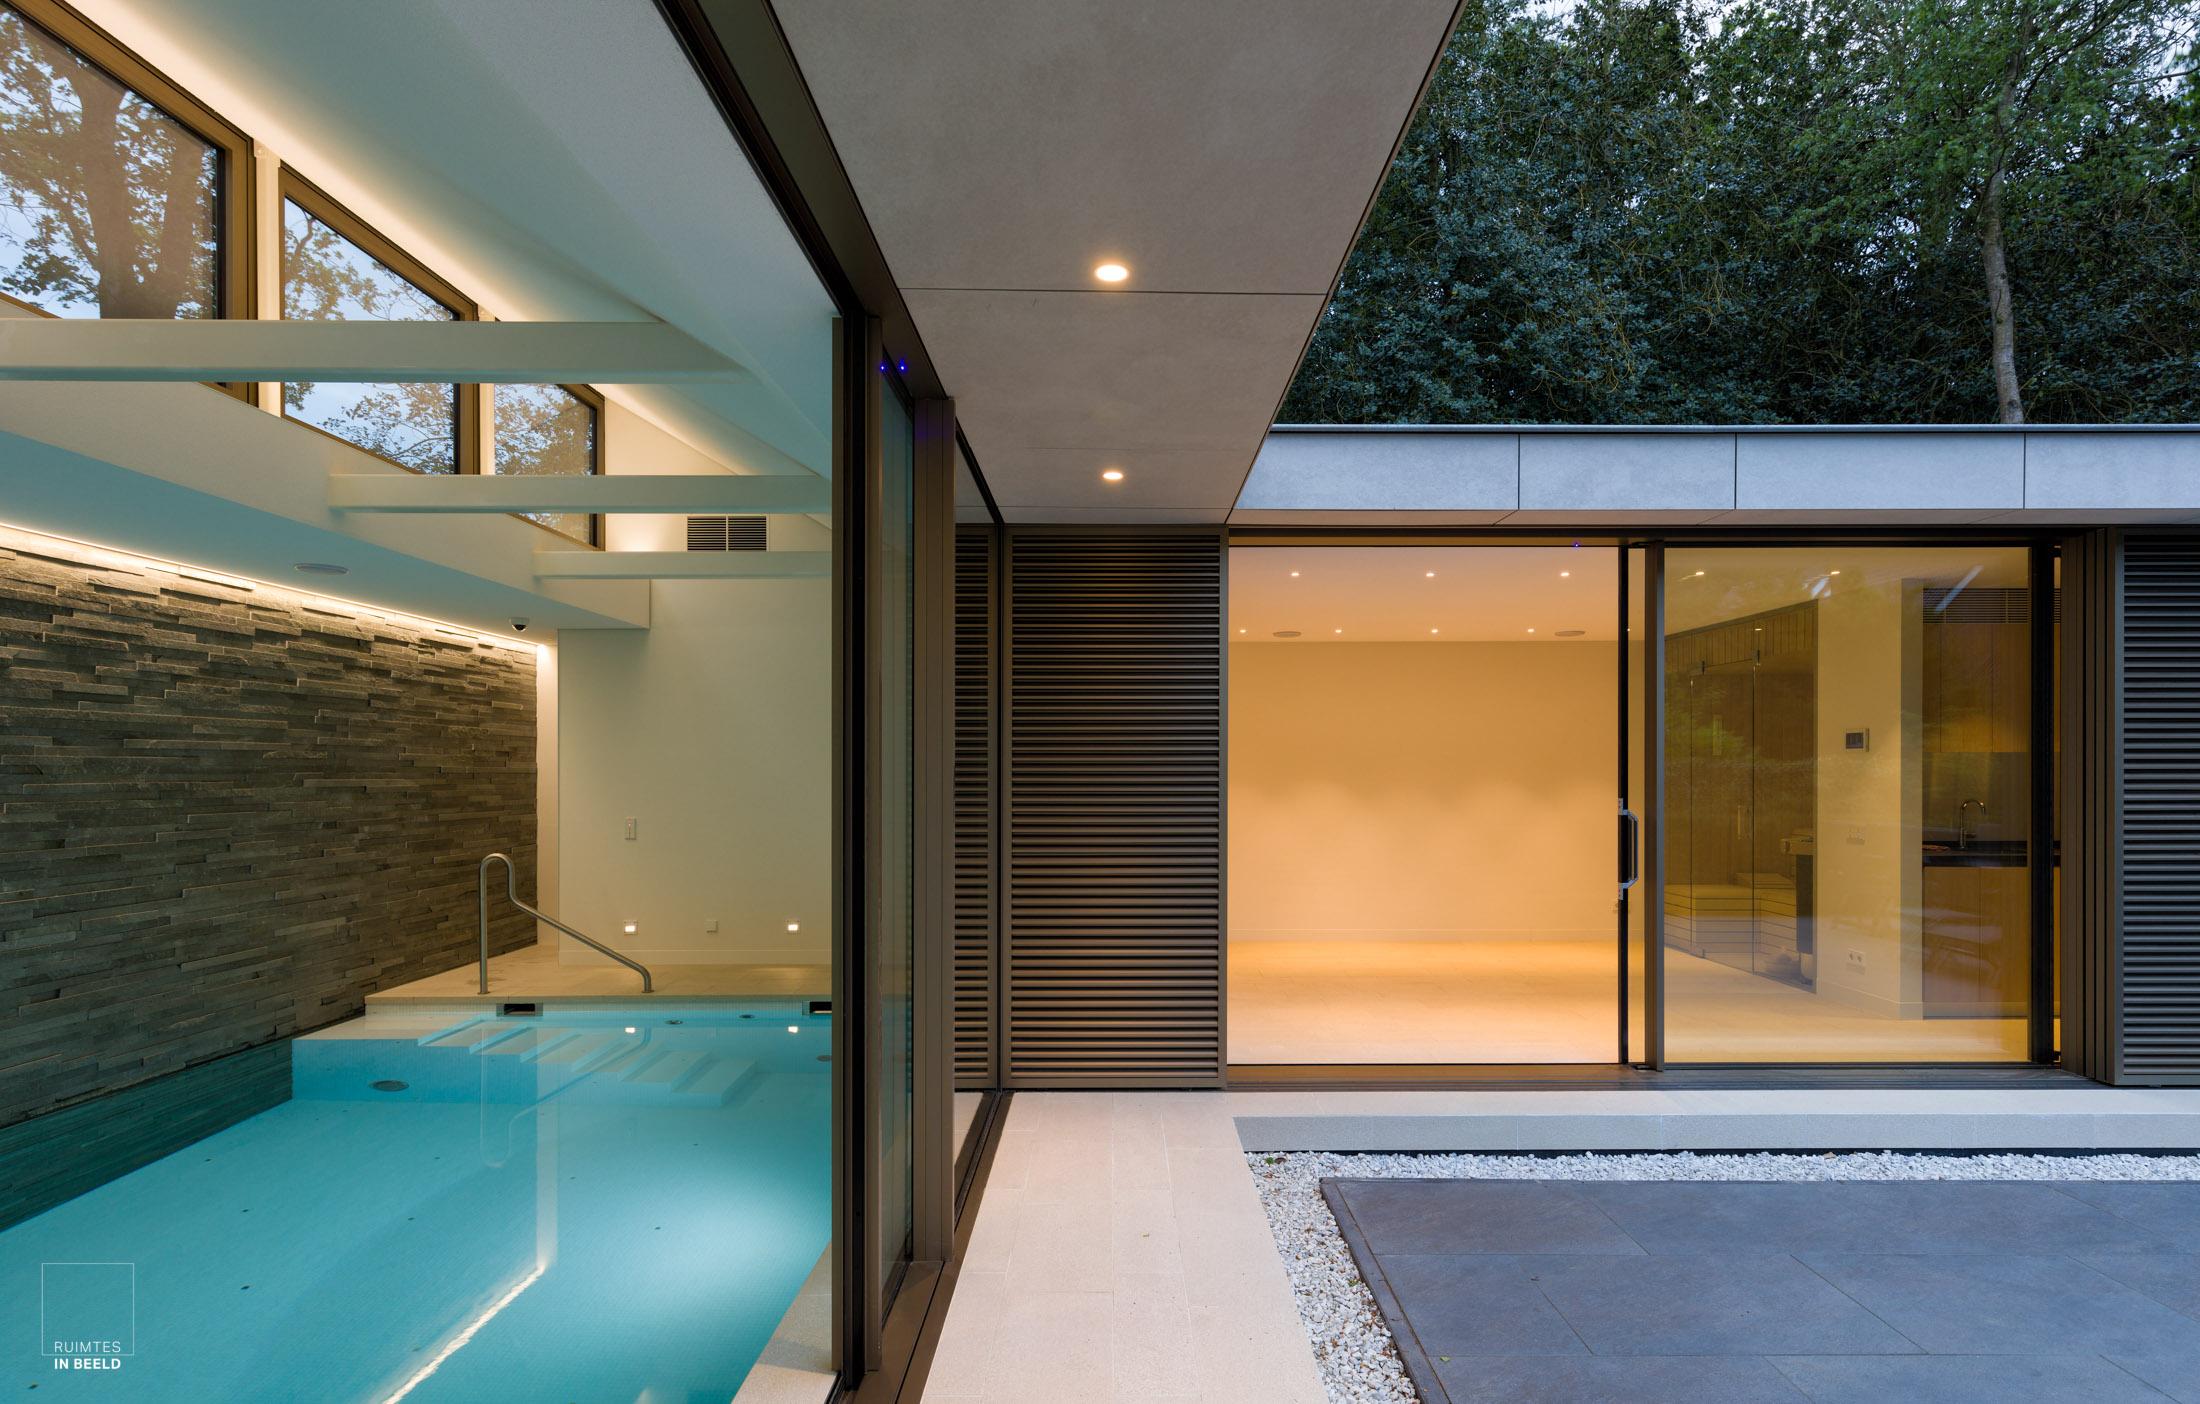 rudy uytenhaak + partners architecten, Amsterdam